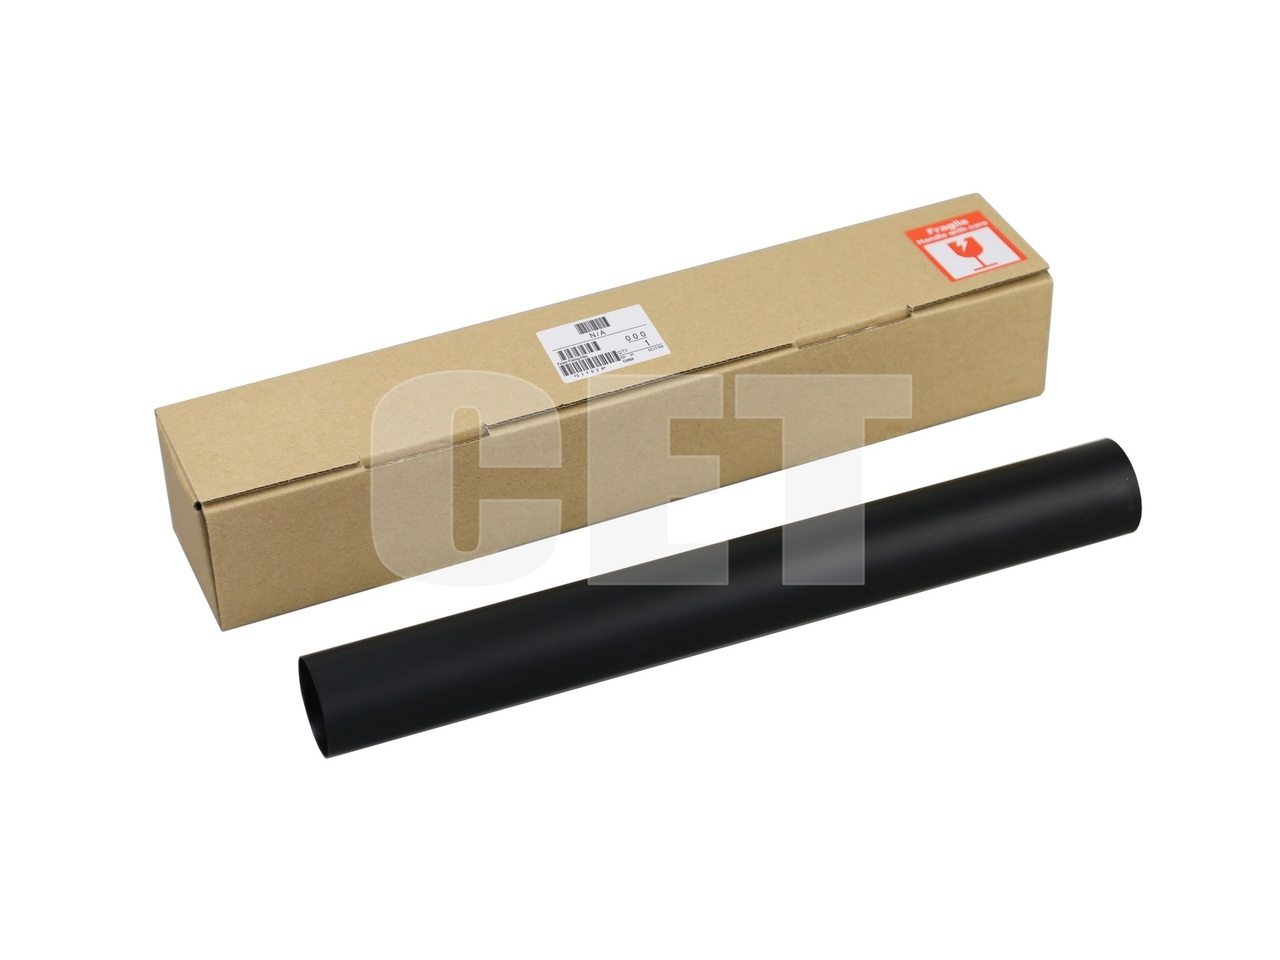 Термопленка (Metal) для KYOCERA ECOSYSP2235dn/P2040dn/M2135dn/M2540dw (CET), CET311024